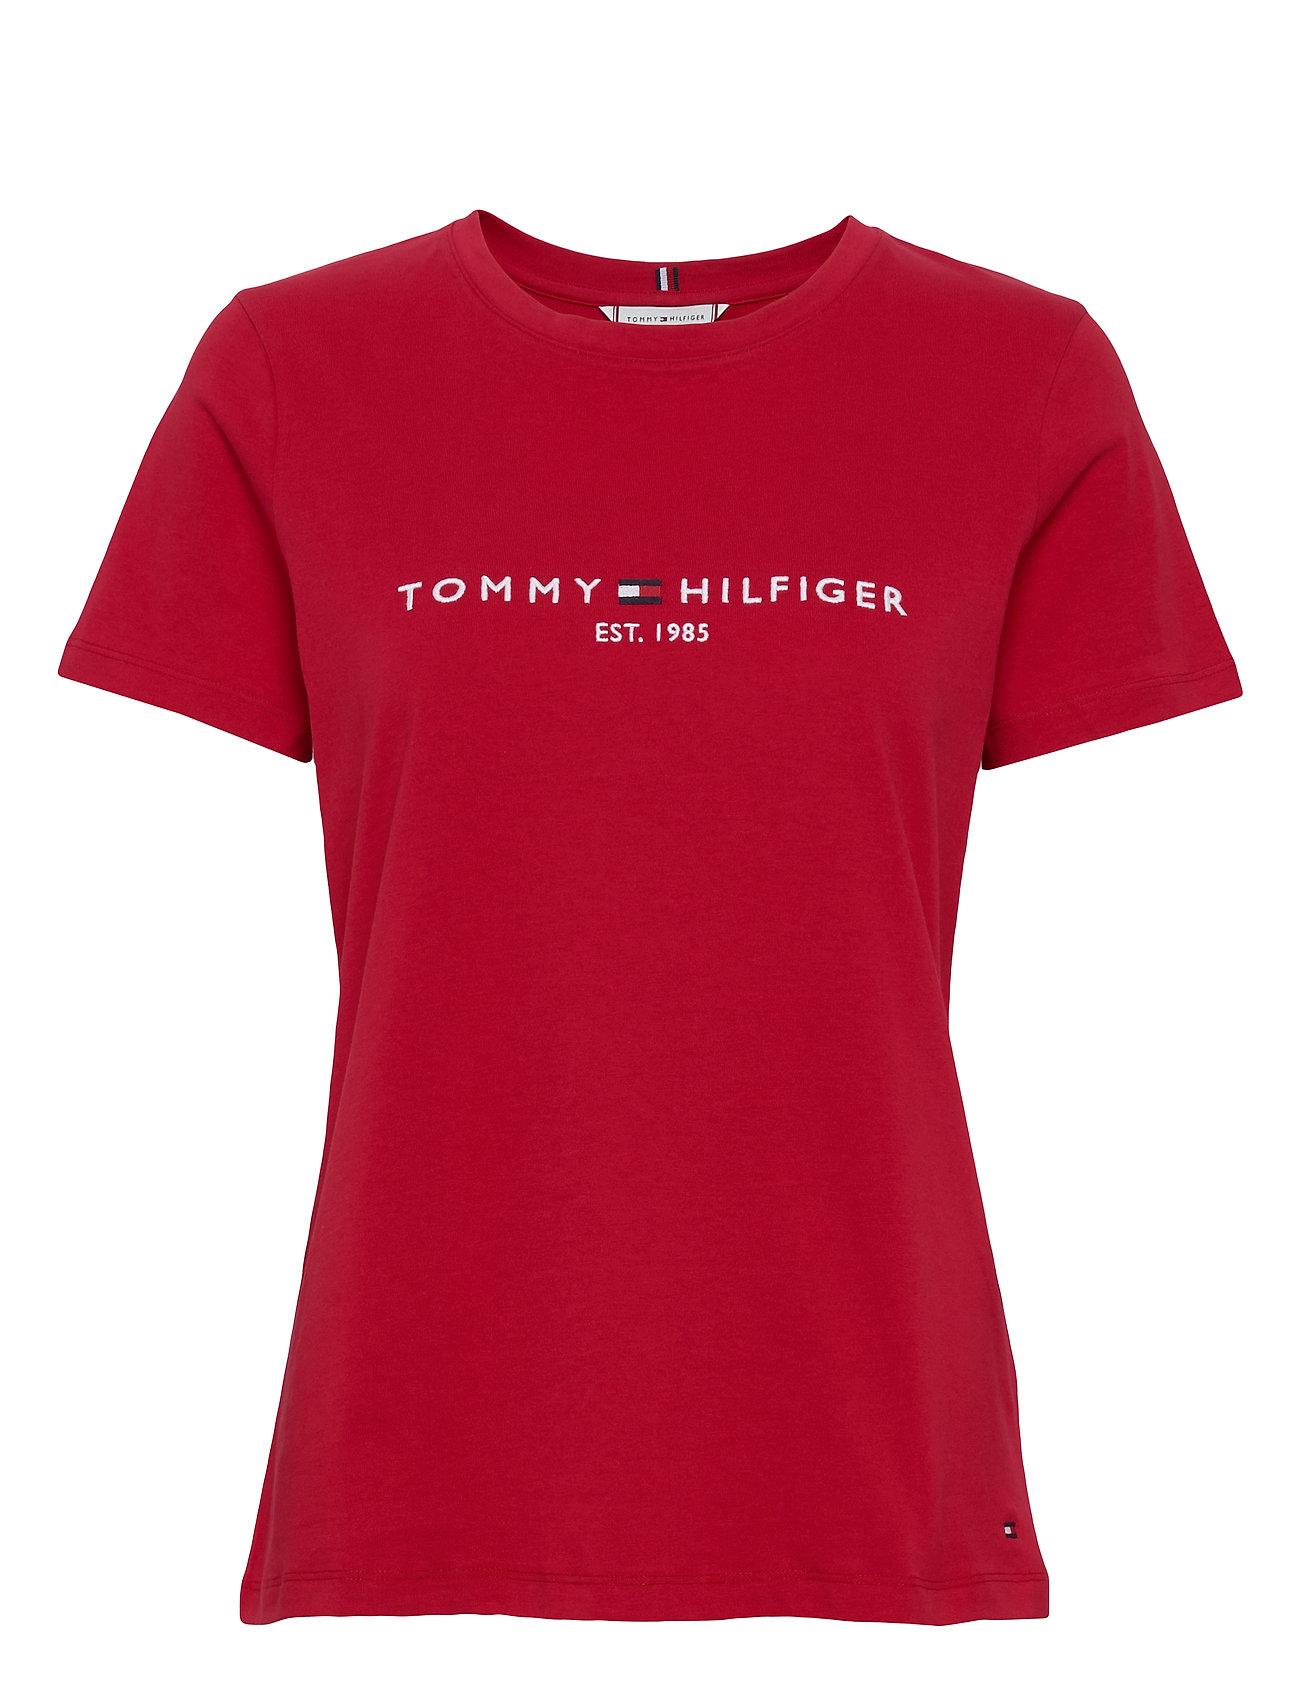 Tommy Hilfiger NEW TH ESS HILFIGER - PRIMARY RED